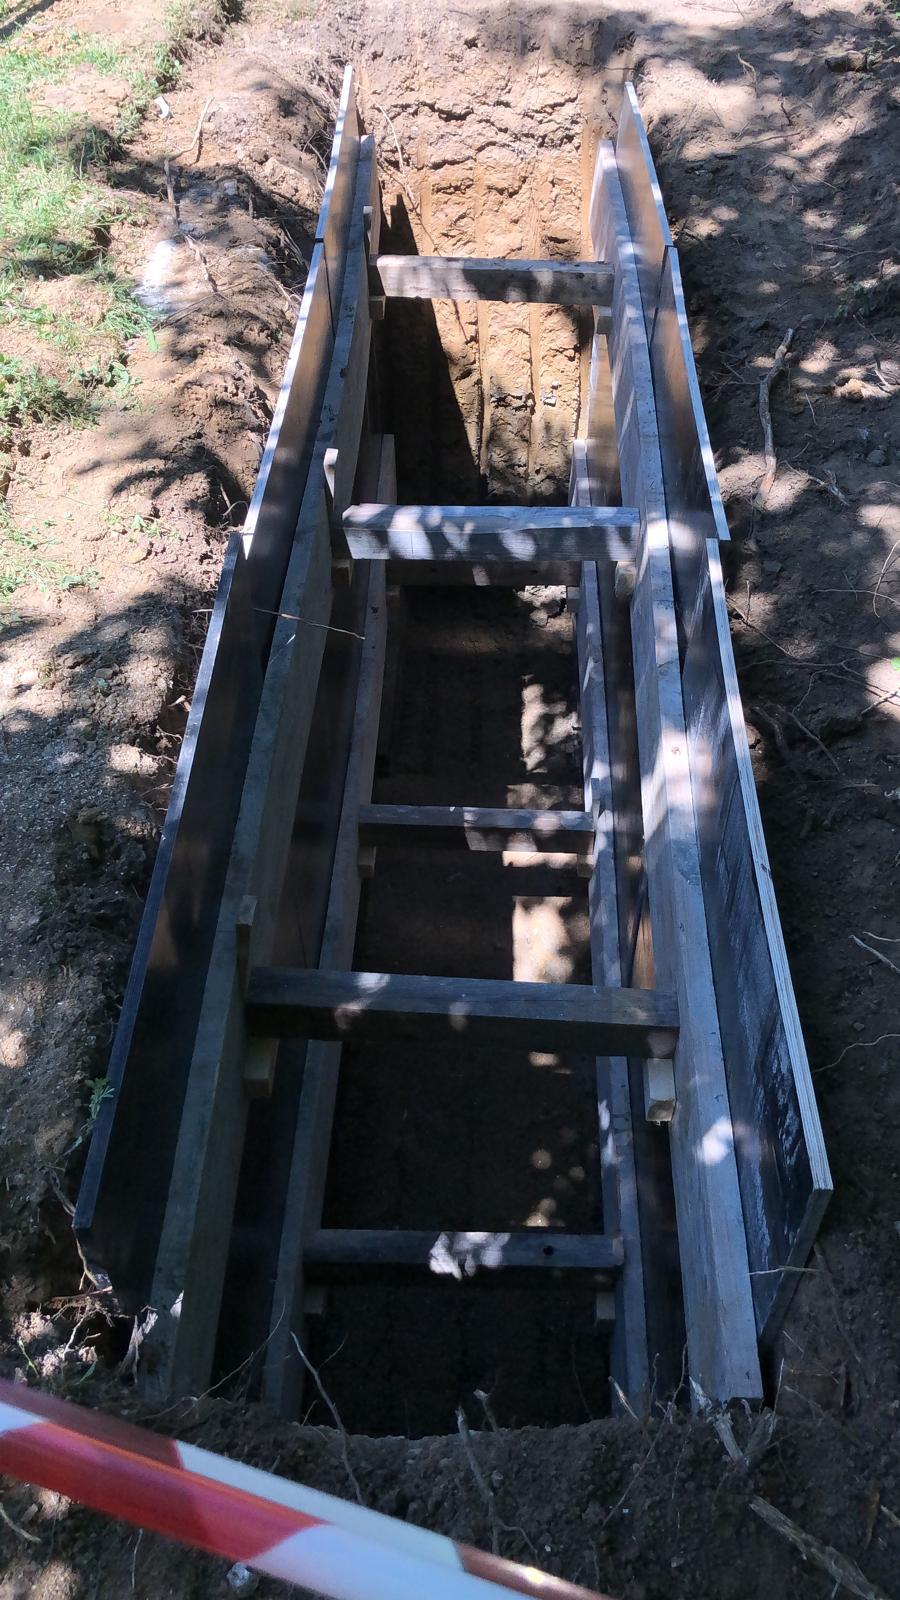 Sonder-Trainings-Anlage Baugrube